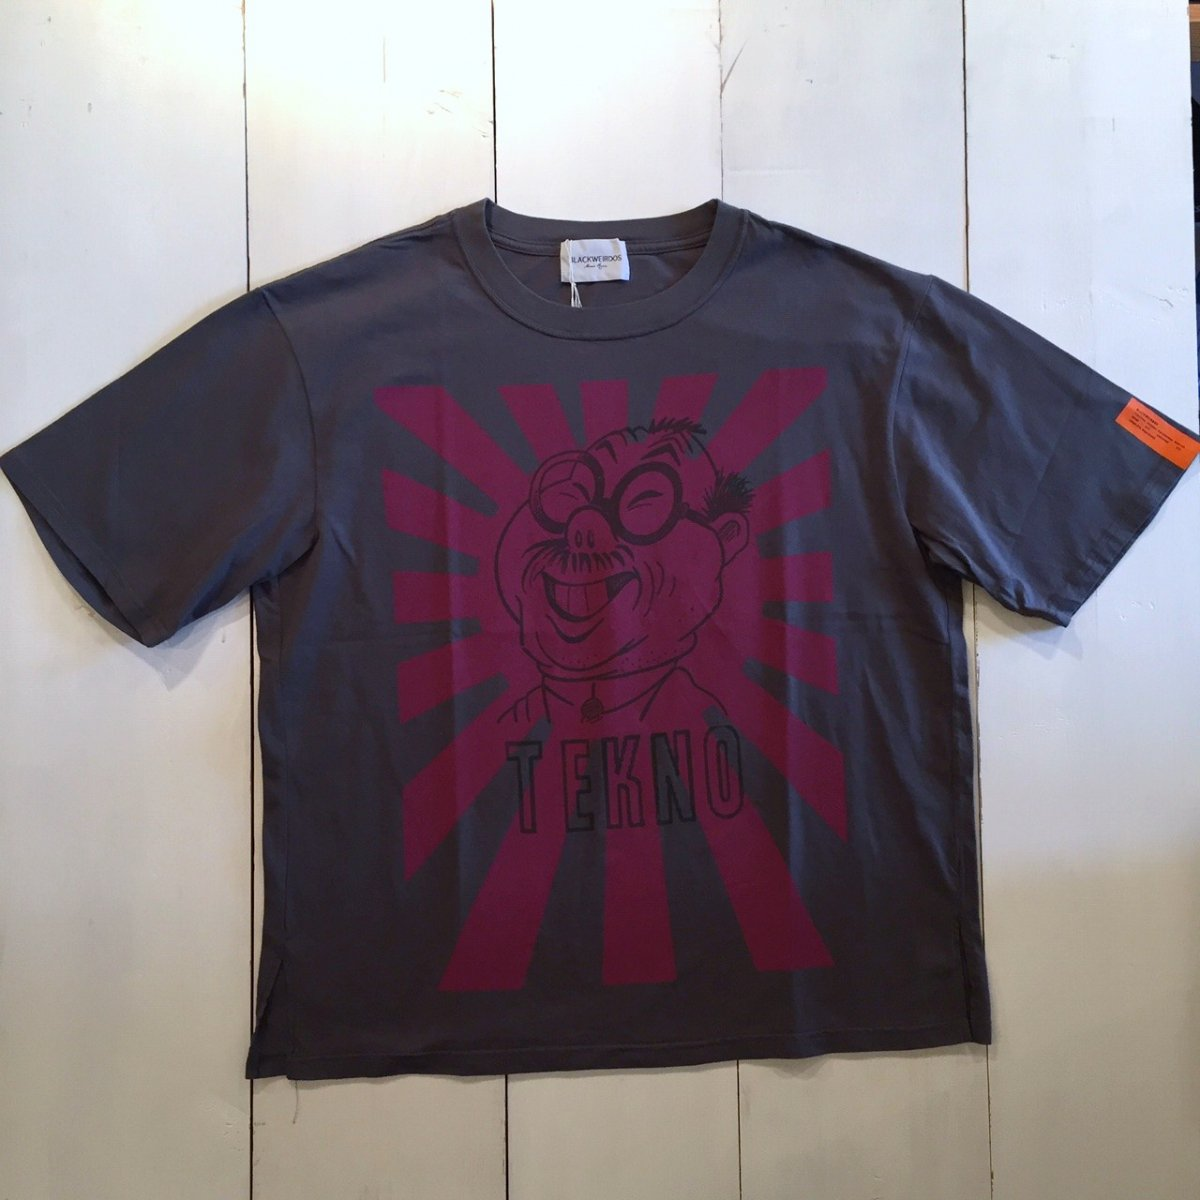 <img class='new_mark_img1' src='https://img.shop-pro.jp/img/new/icons3.gif' style='border:none;display:inline;margin:0px;padding:0px;width:auto;' />Black Weirdos  ブラック ウィドー / Tシャツ TEKNO JAP Tee 【GRAY】